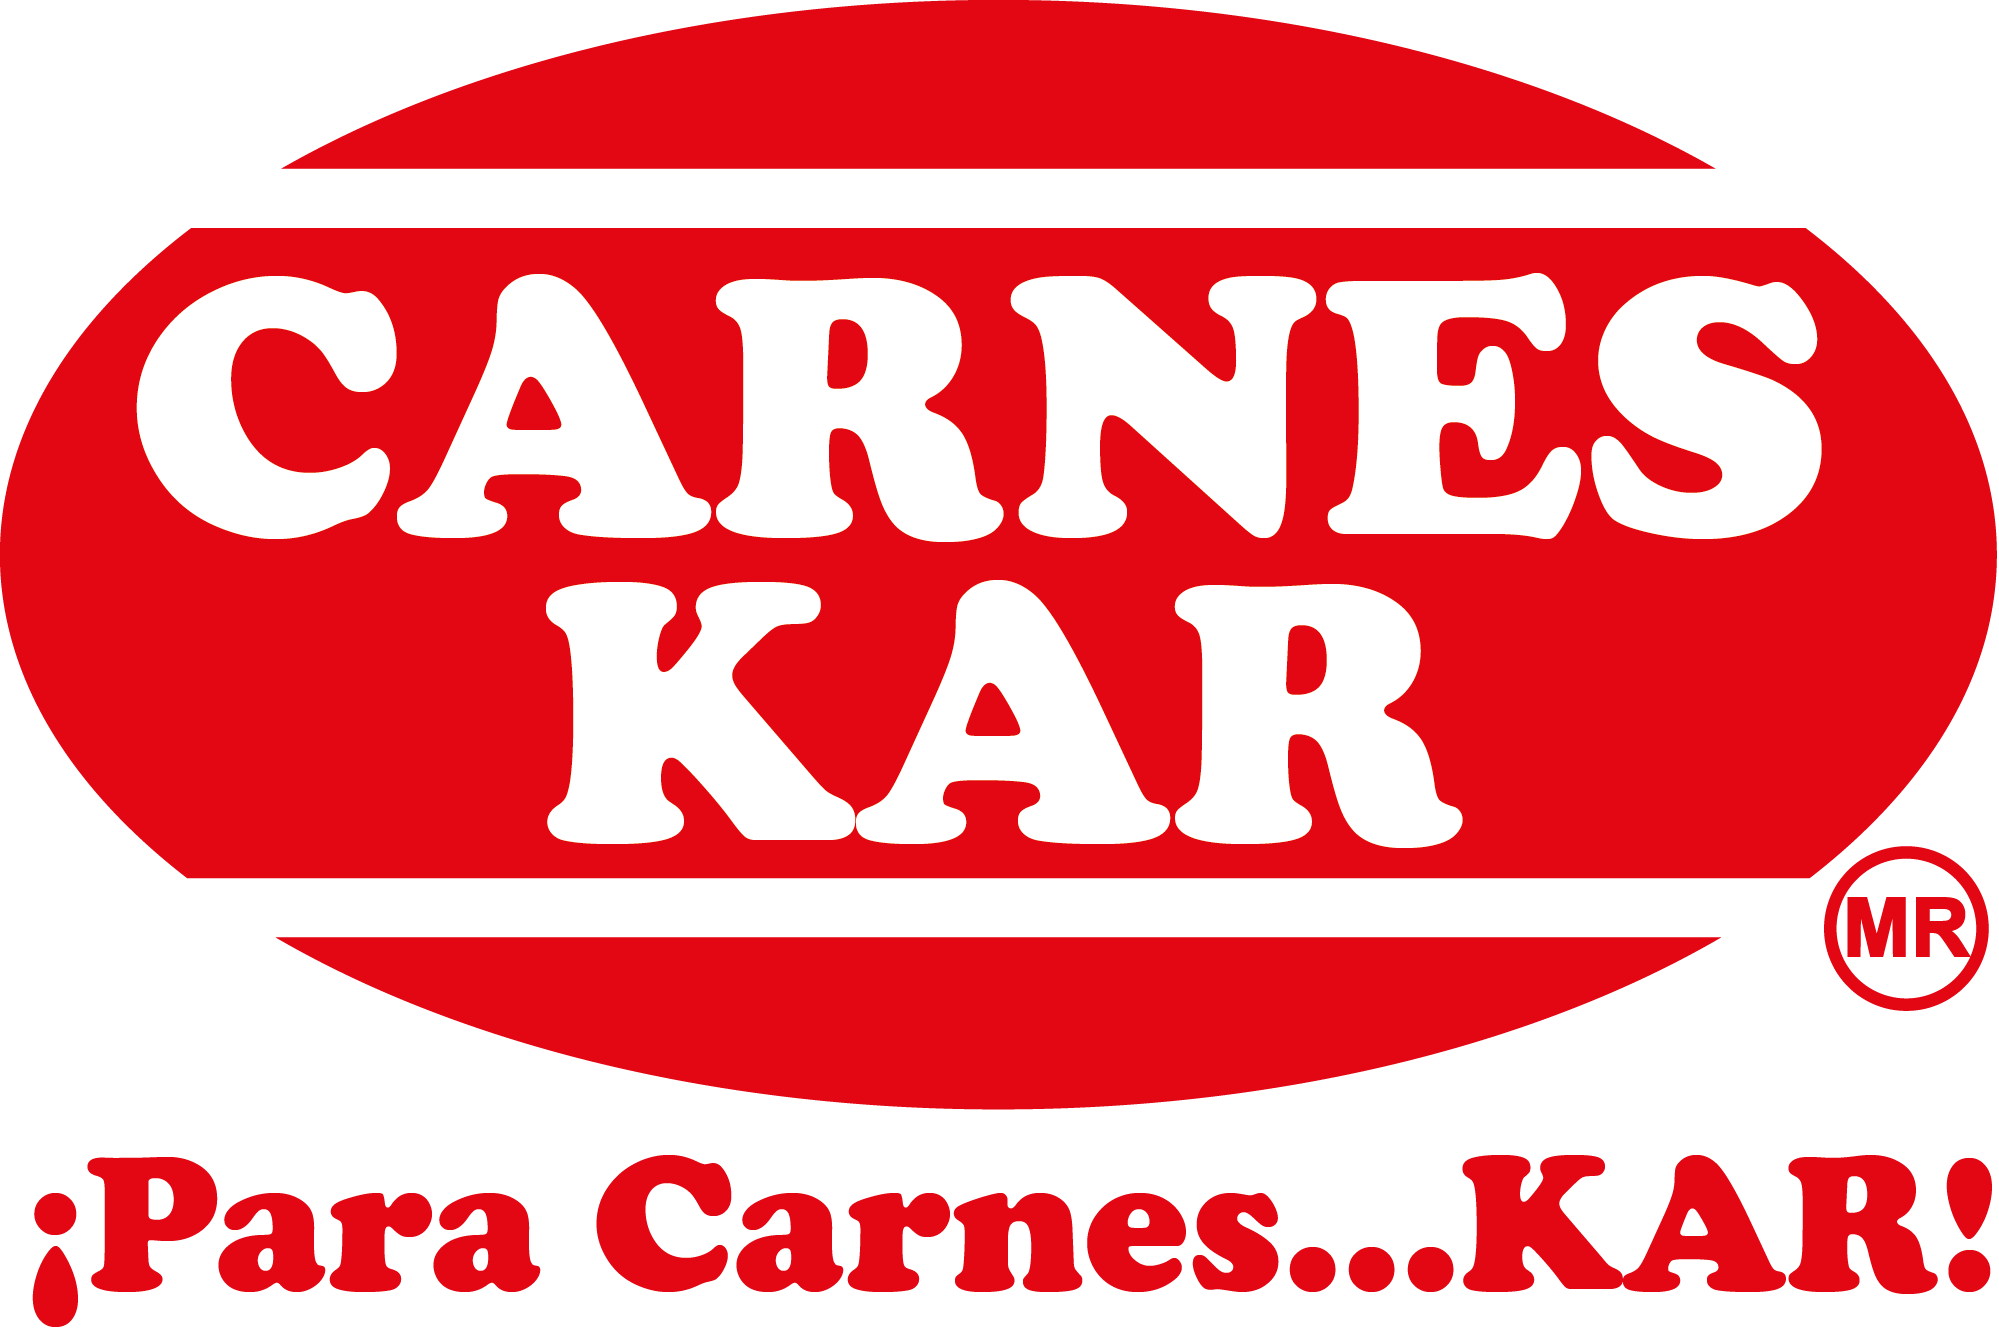 Carneskar